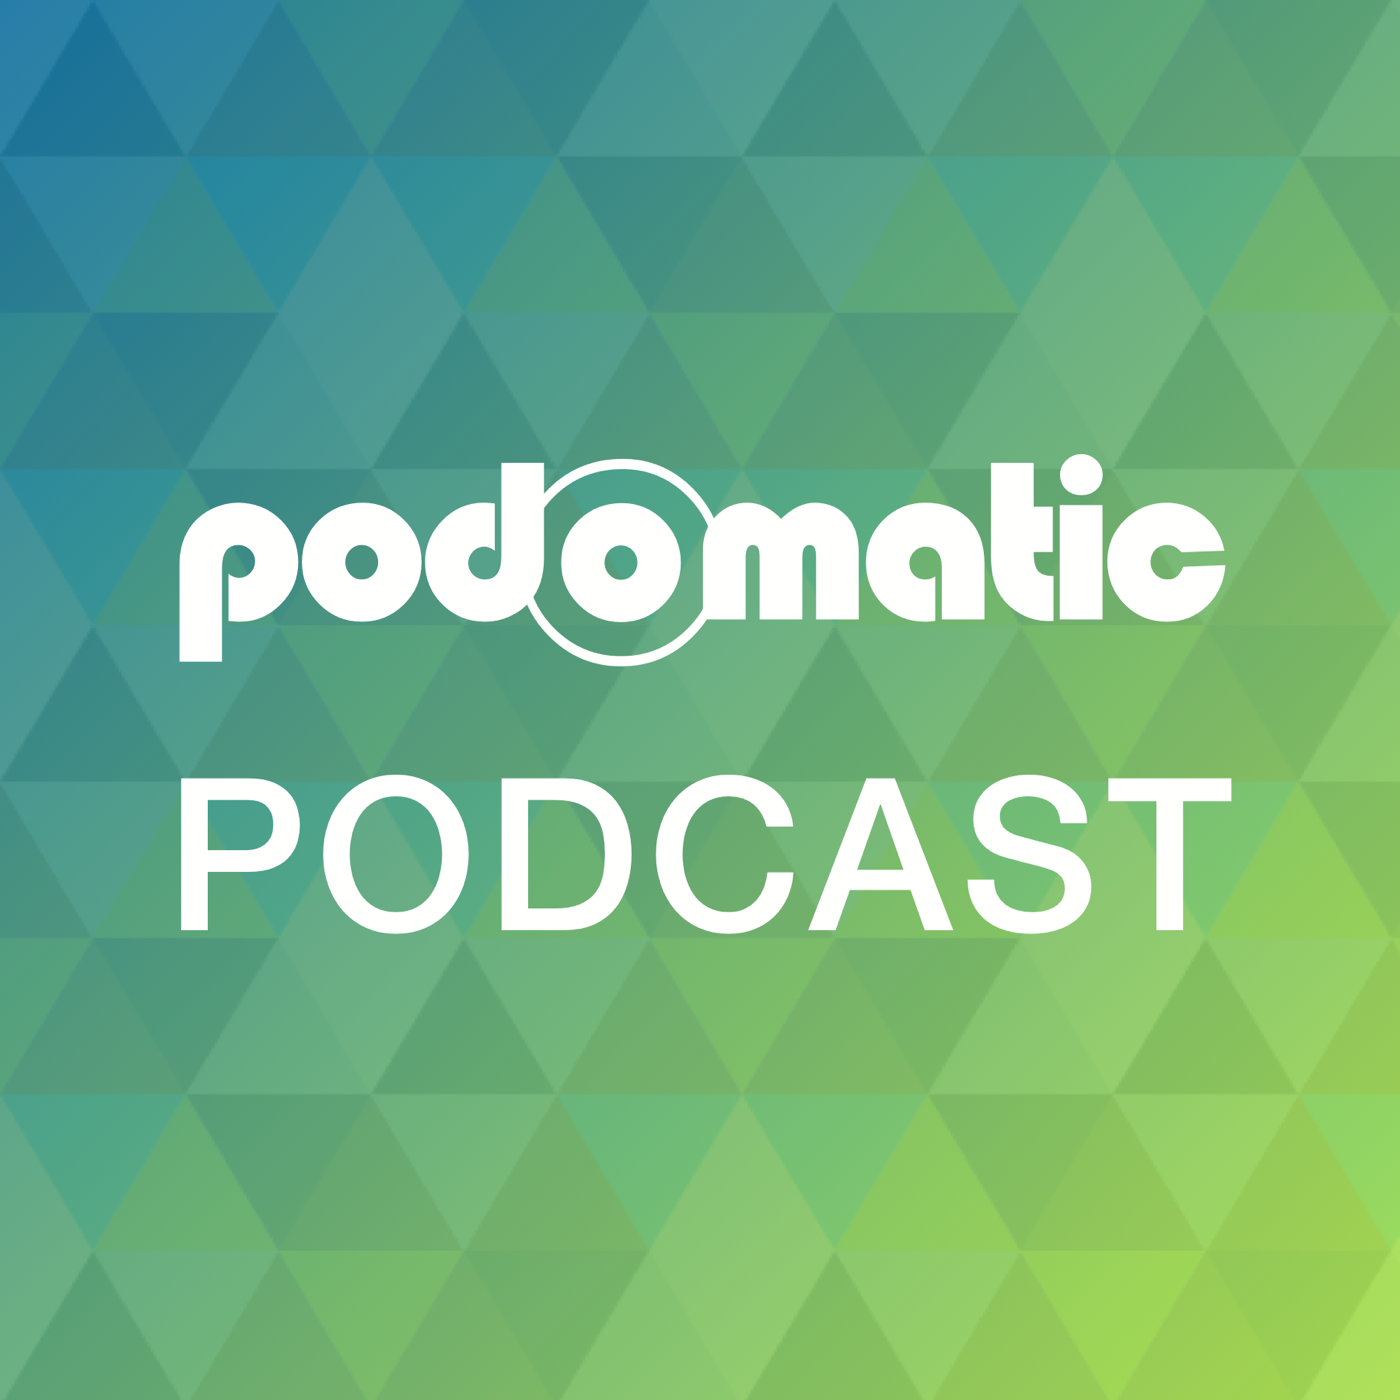 RJ Lamont's Podcast